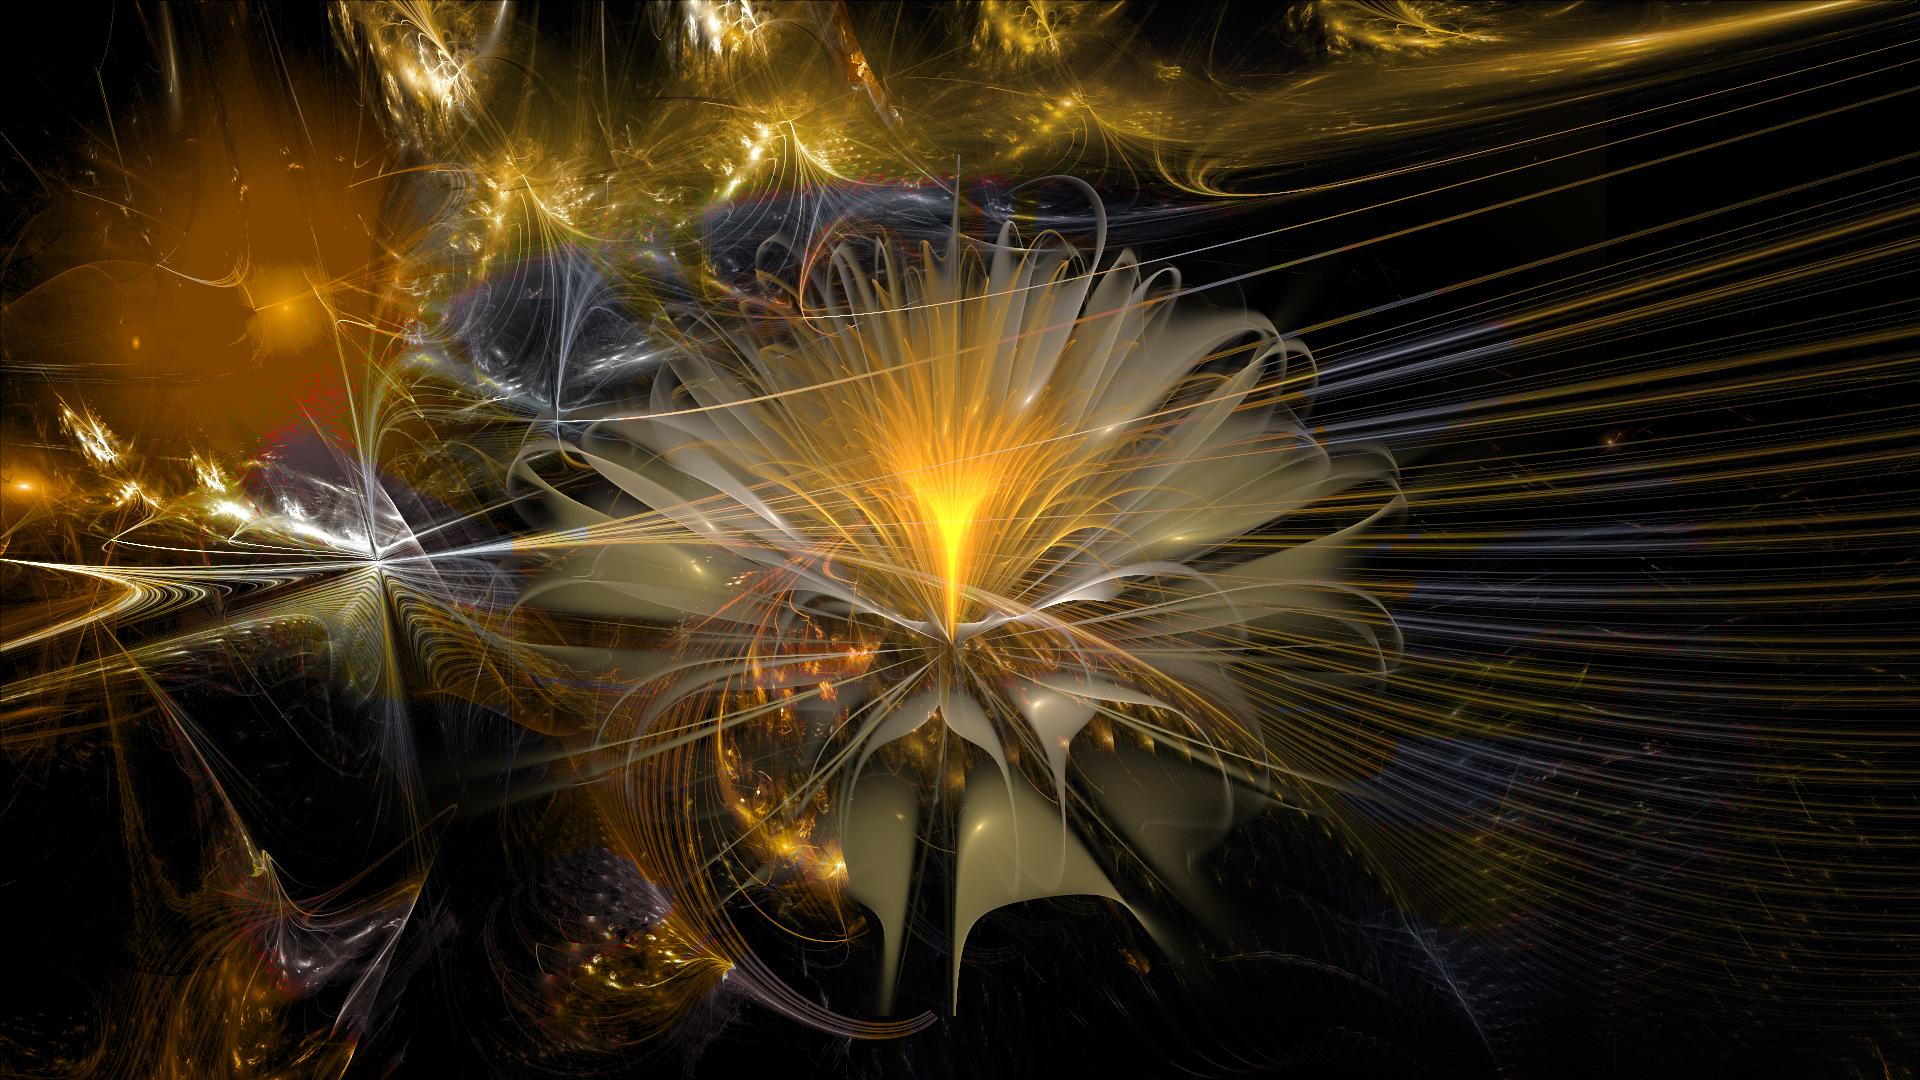 The Galactic Flower by Fractamonium